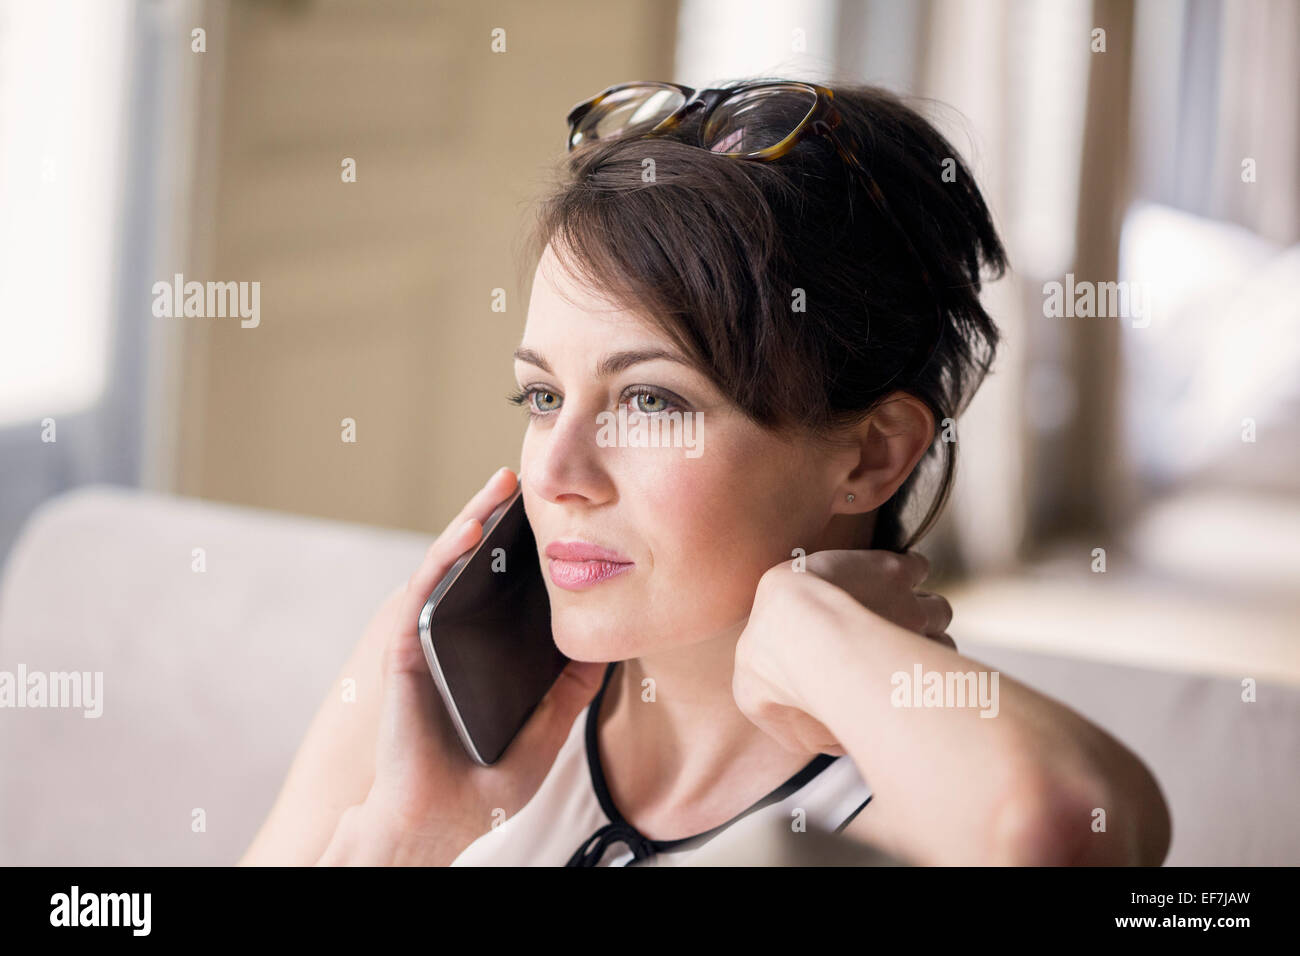 Schöne Frau im Gespräch auf dem Handy Stockbild